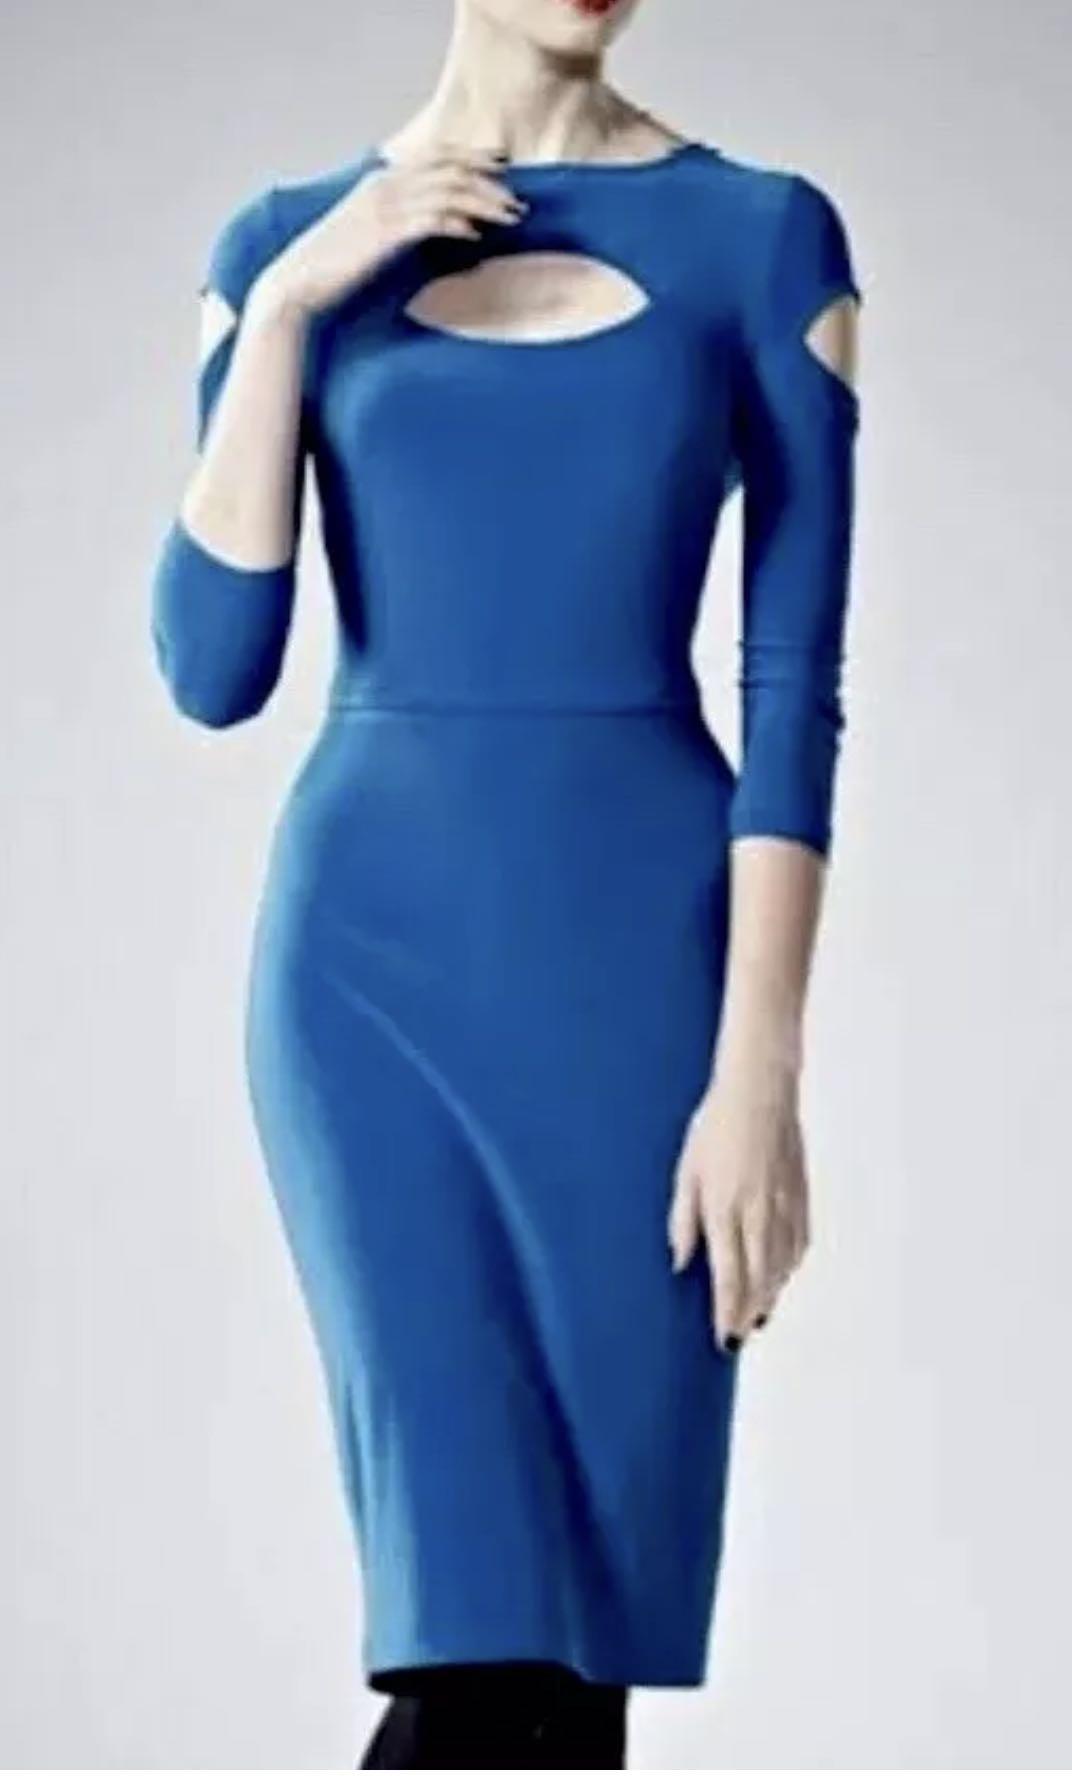 Ladies LEONA EDMISTON Annalise Sapphire Stretch Dress. Size 1. NWT $245